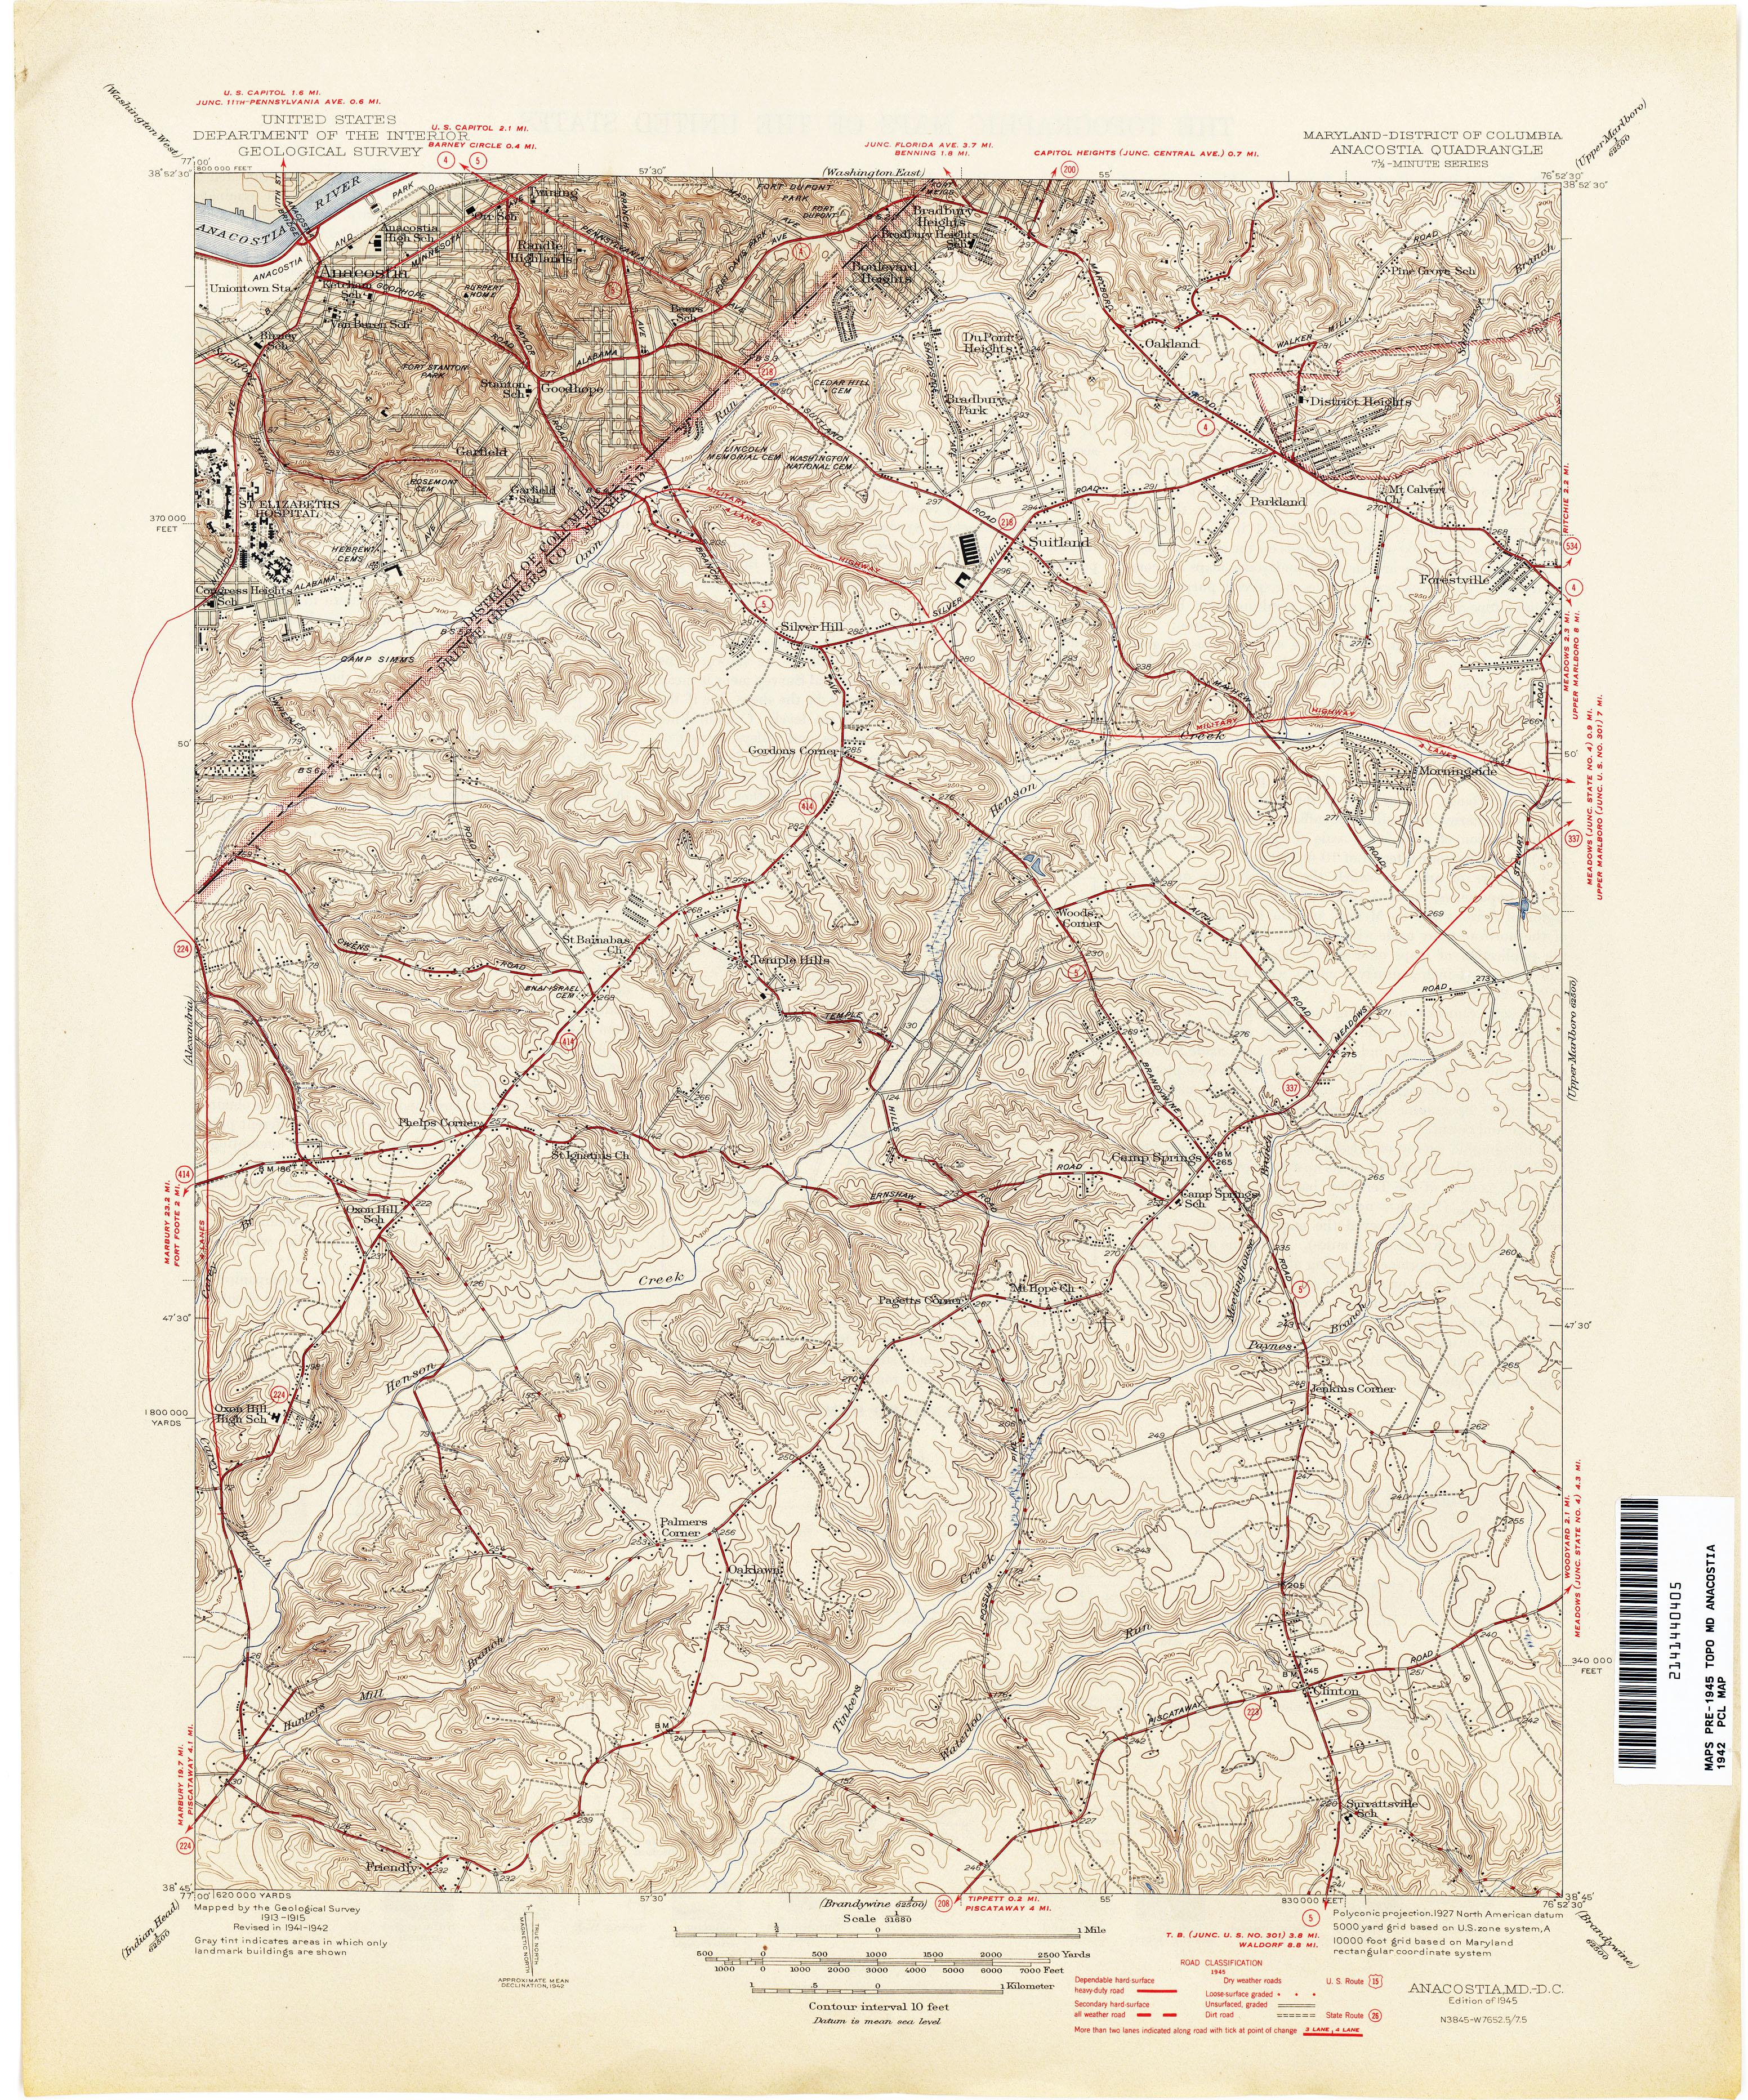 Maryland Historical Topographic Maps  PerryCastaeda Map